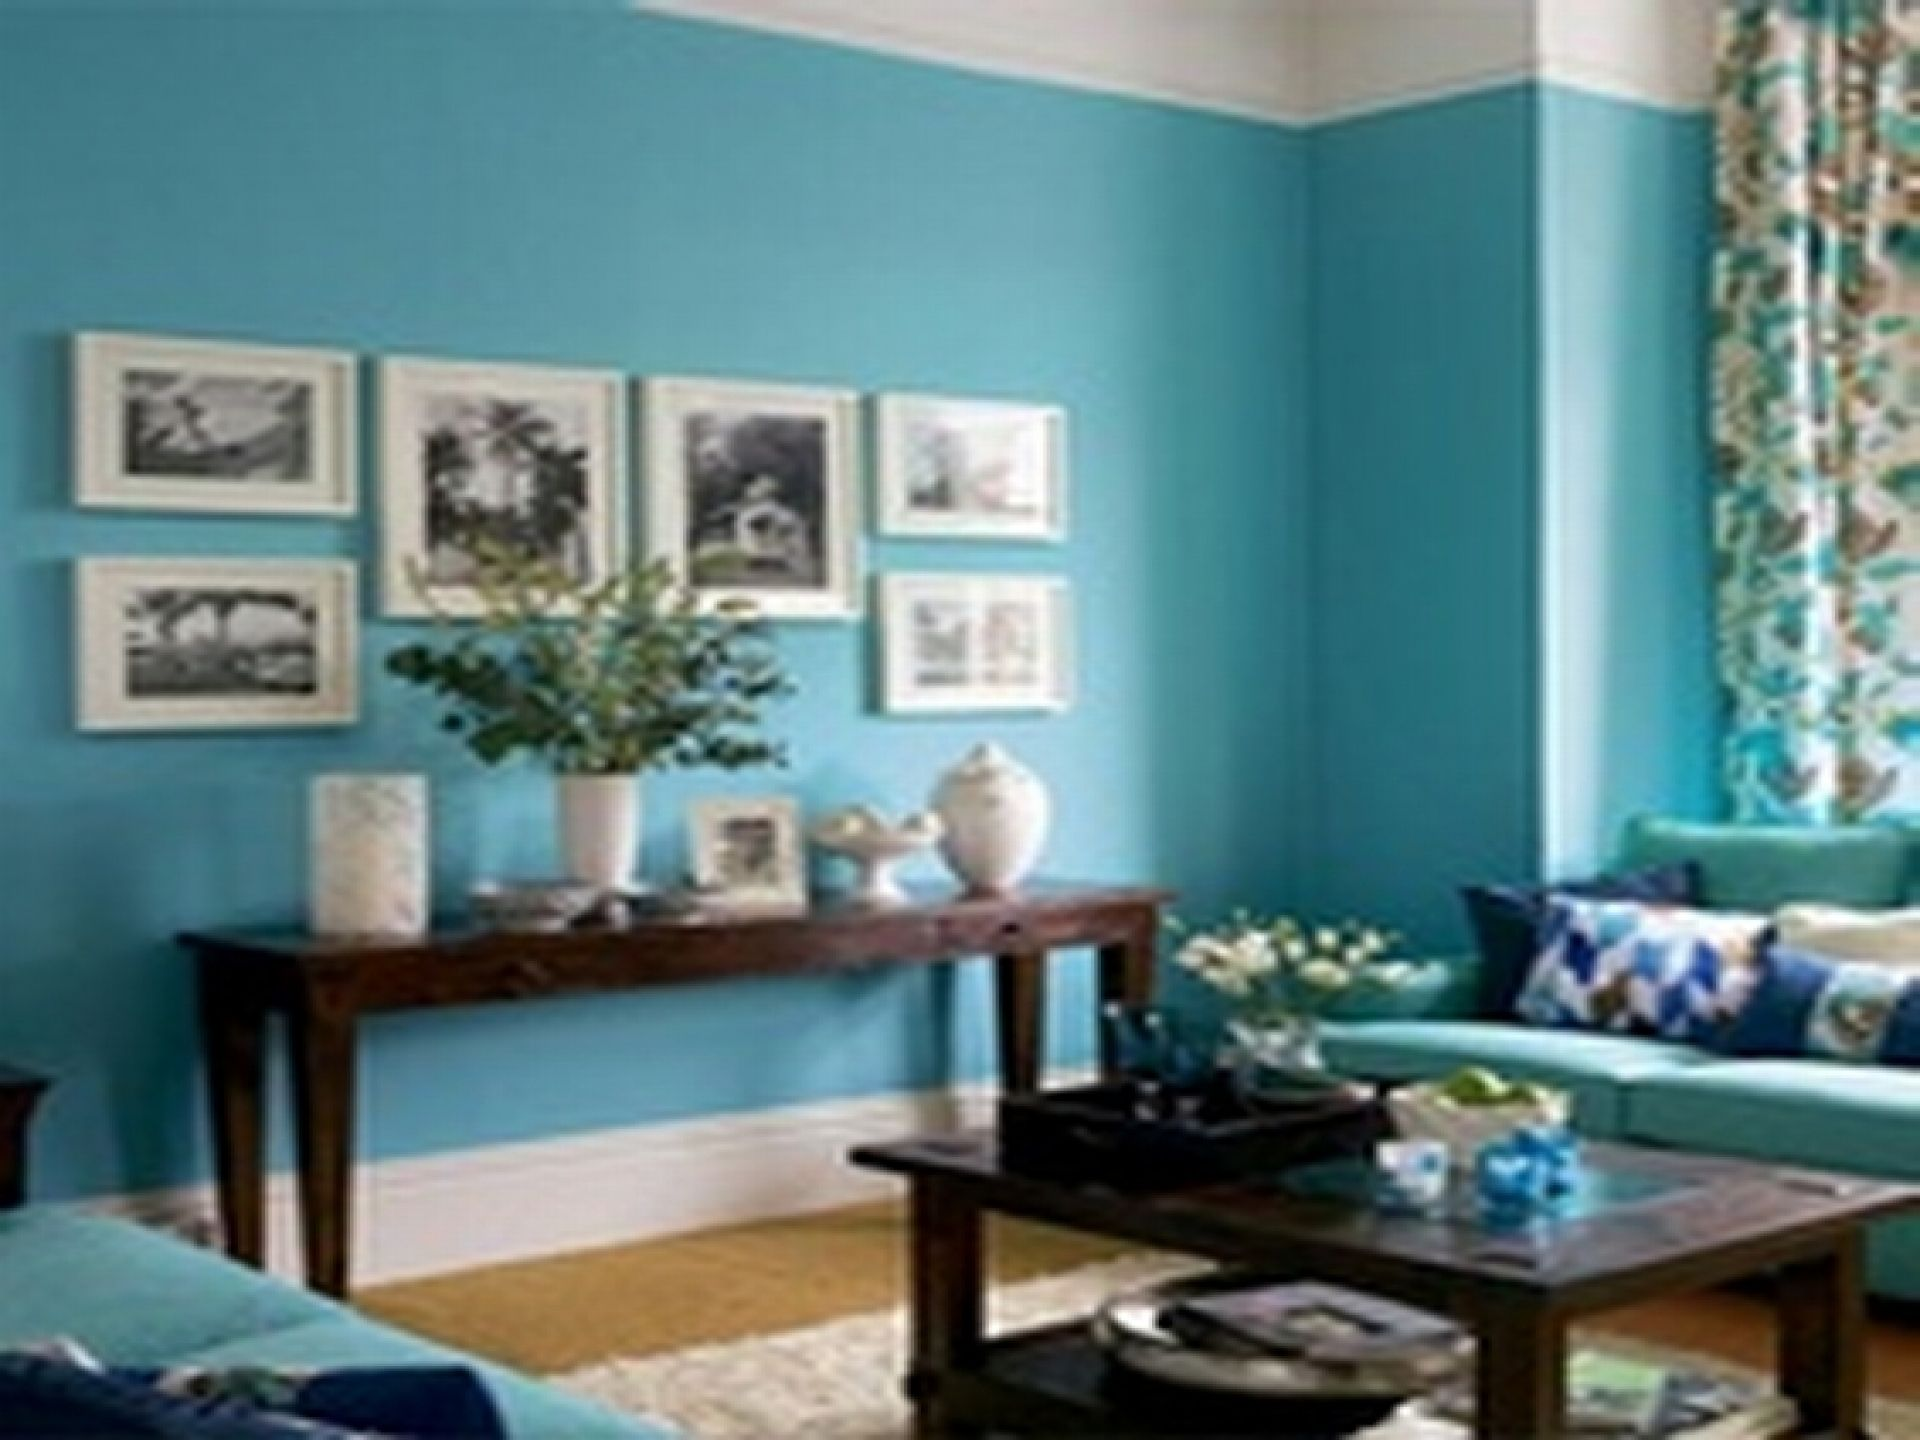 Interior Decor Brown Turquoise Blue Paint Colors Decorating Ideas